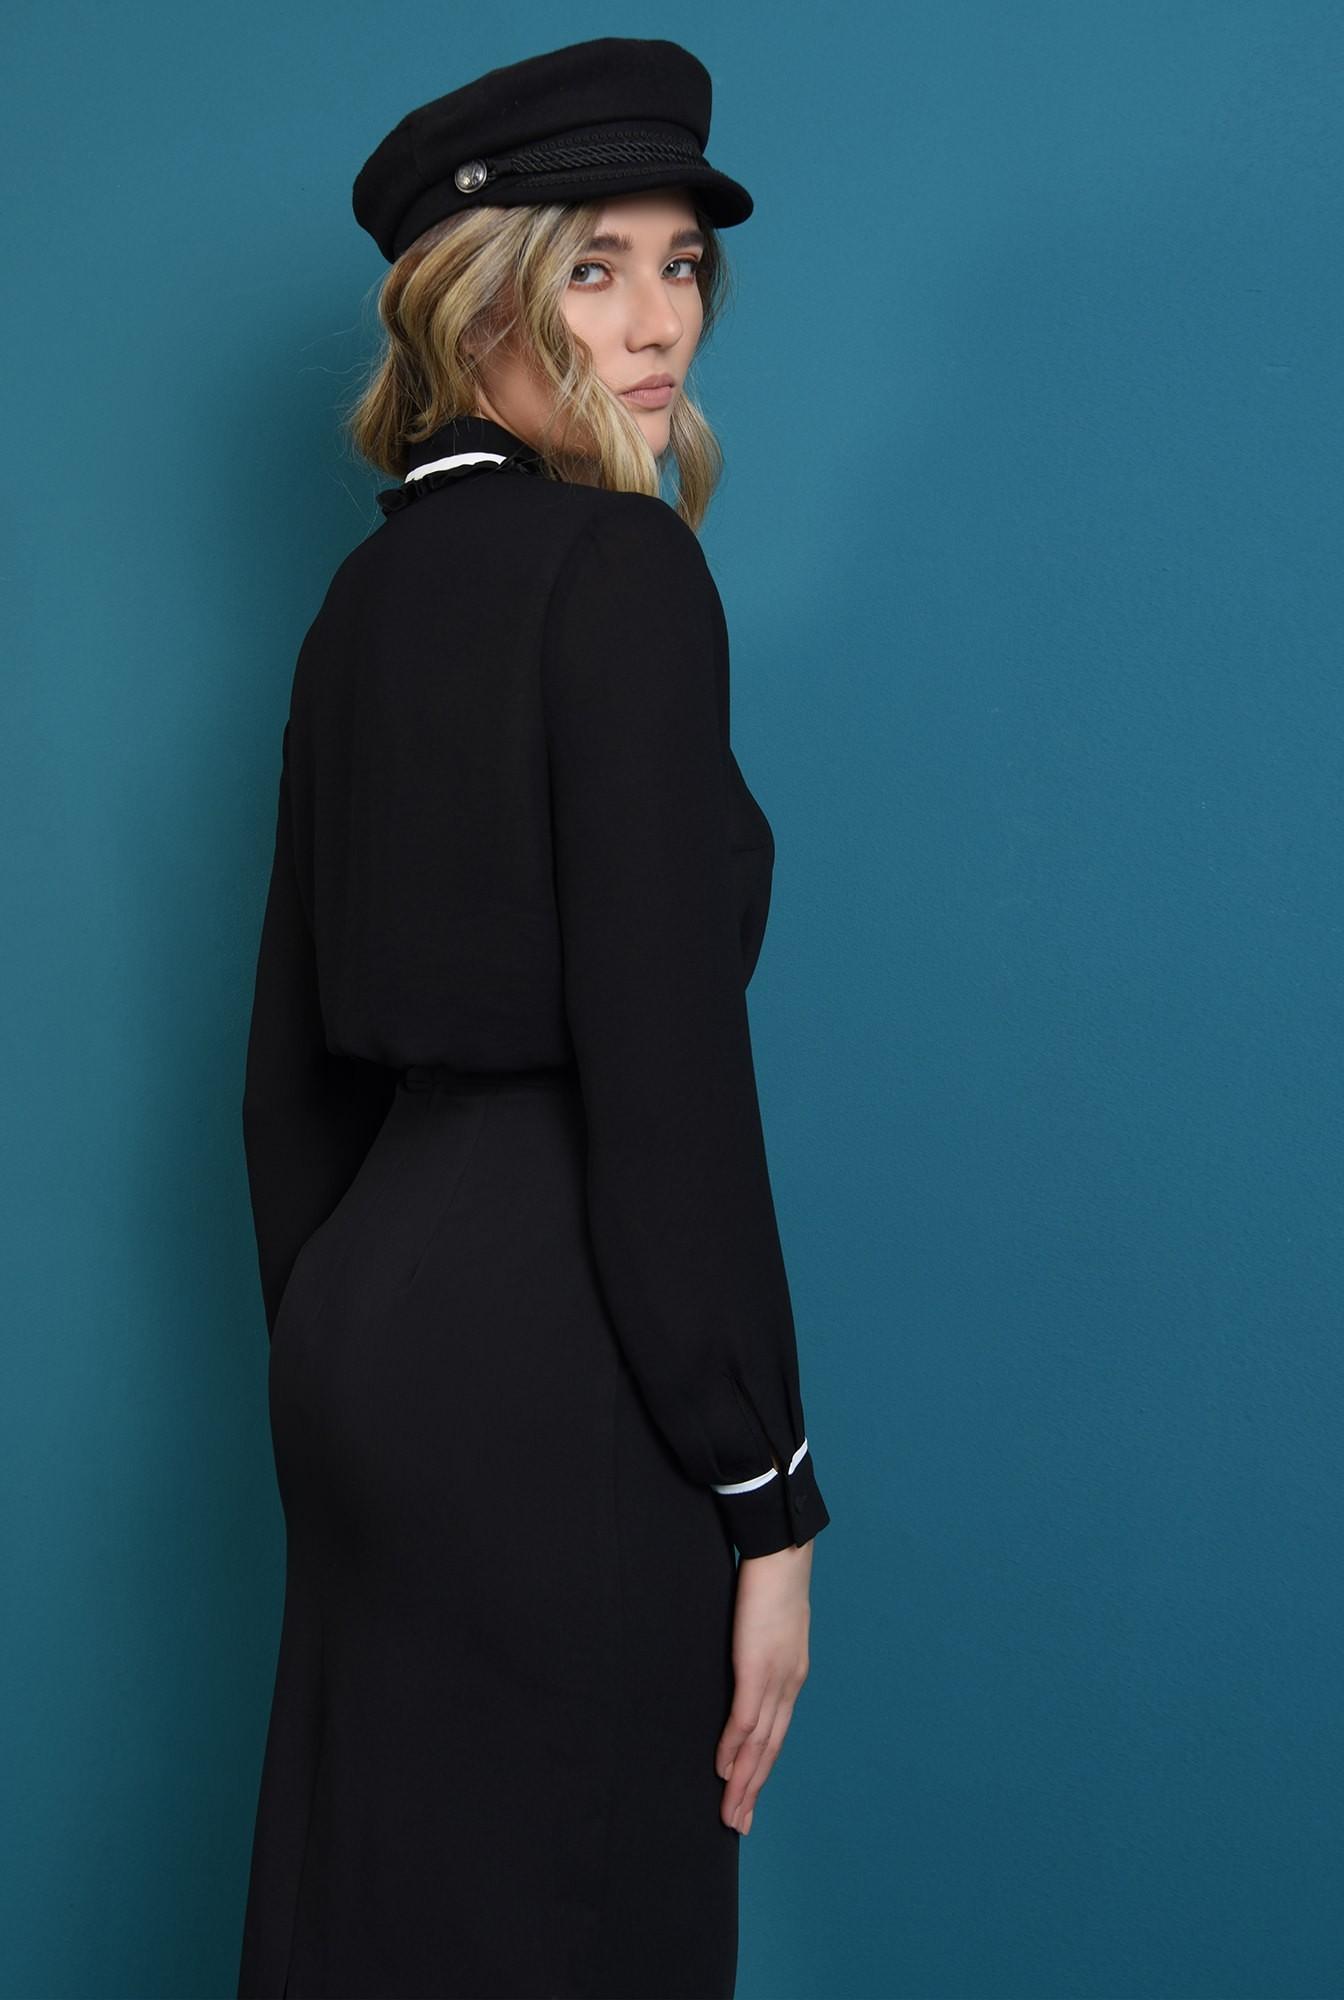 1 - bluza neagra,lejera, cu nasturi, cu maneca lunga